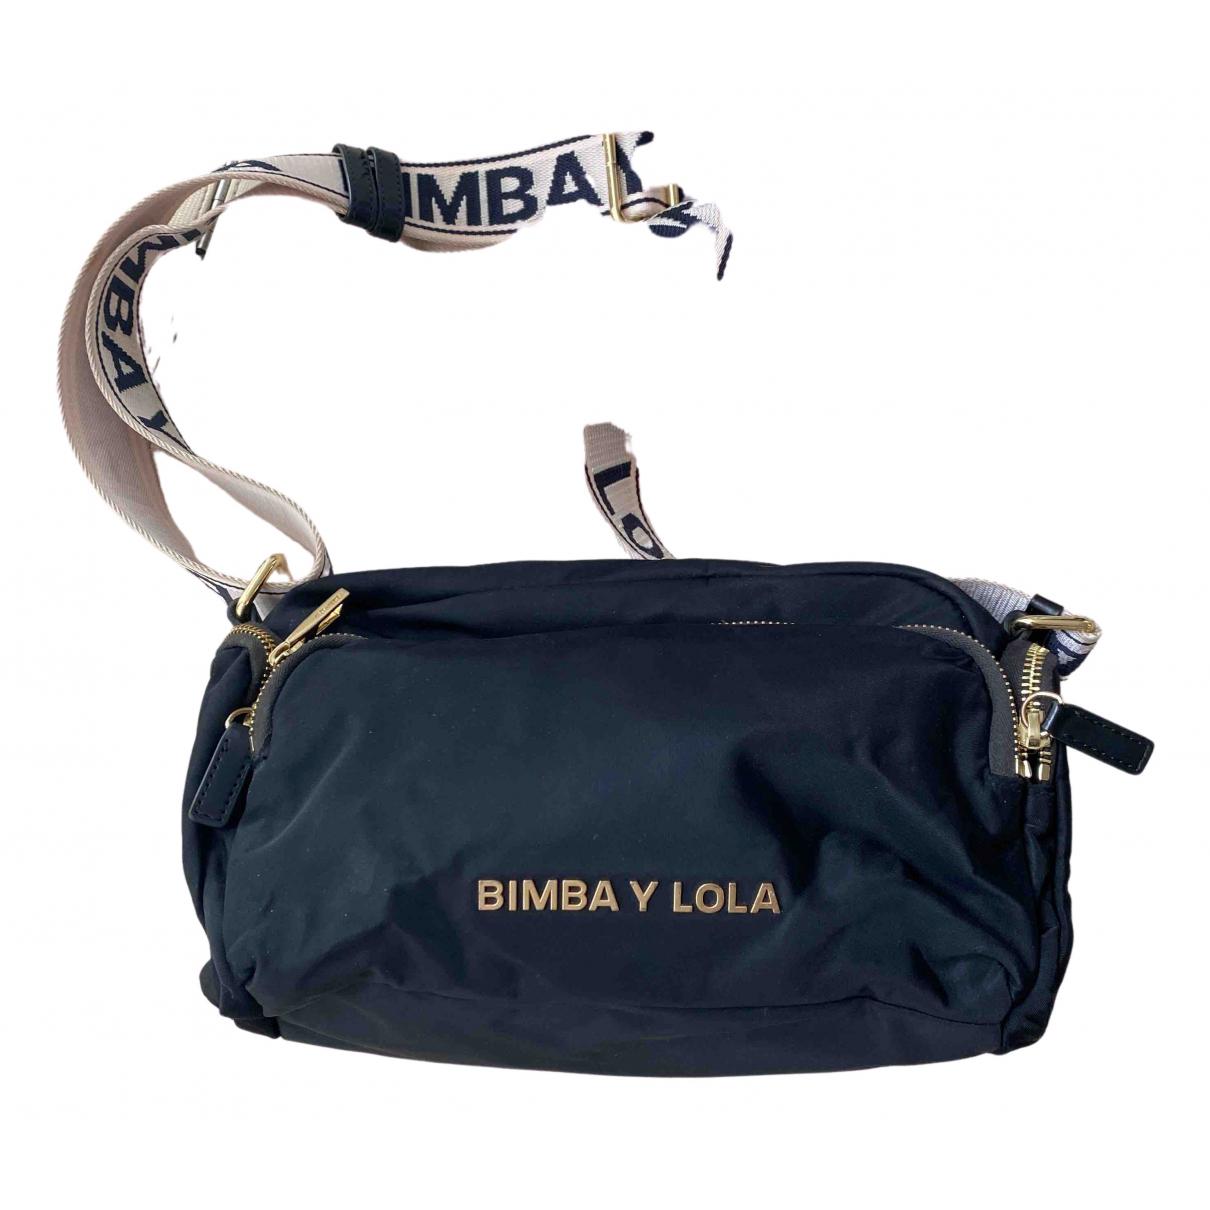 Bimba Y Lola \N Black handbag for Women \N